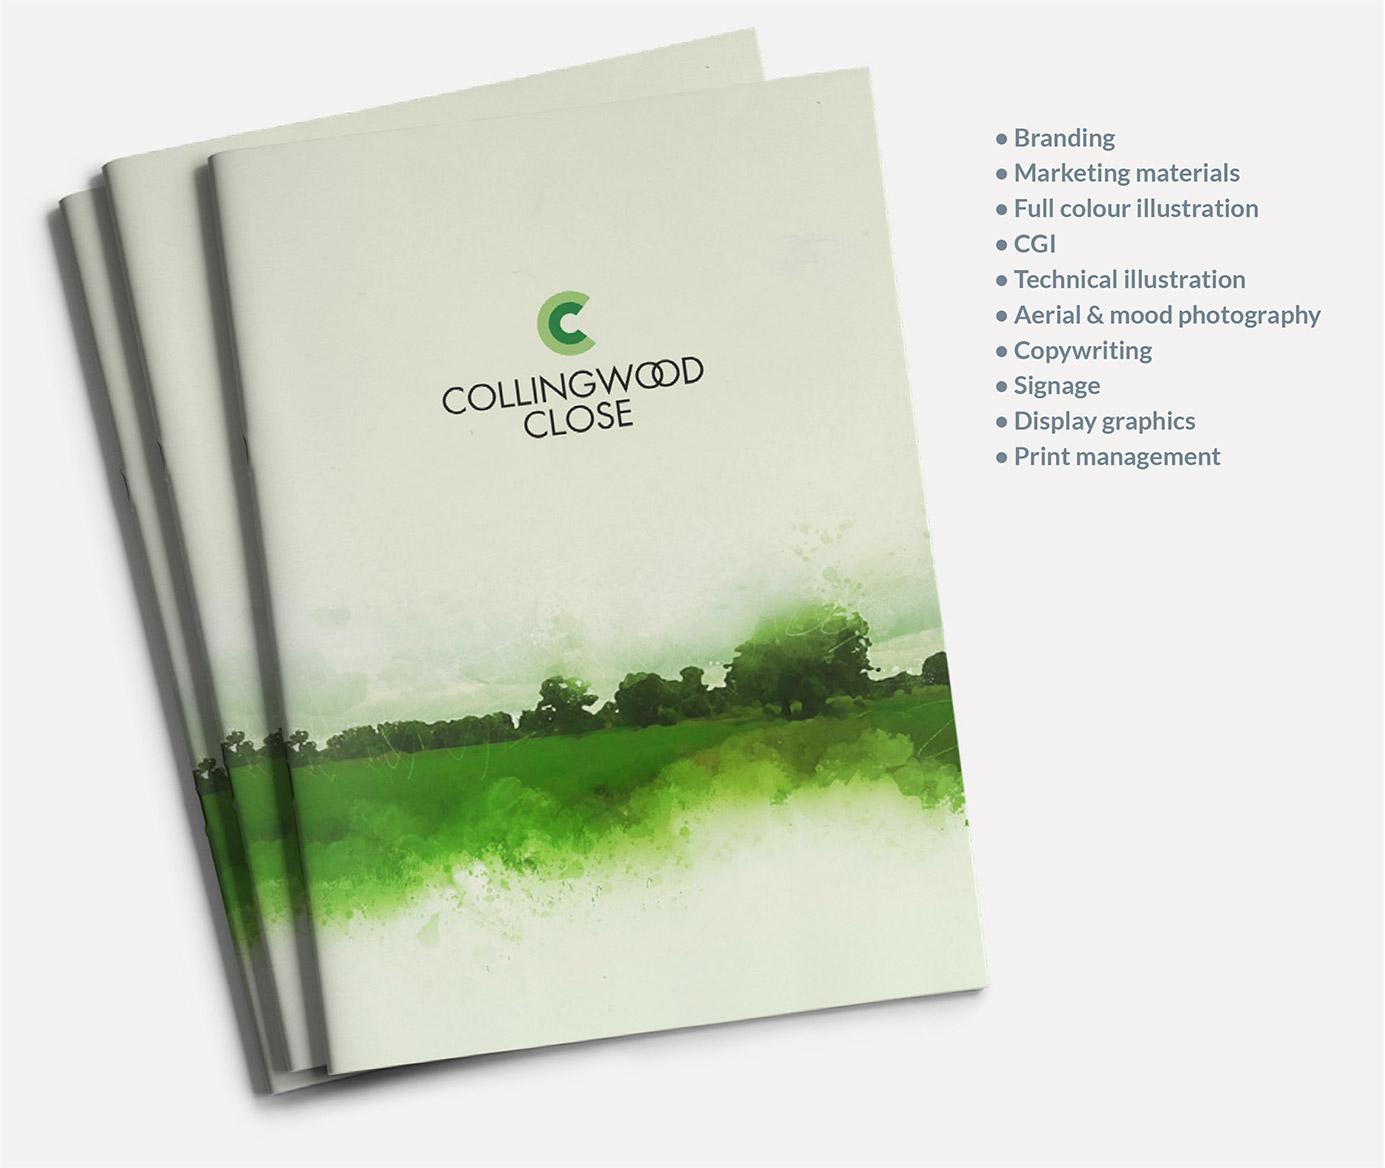 collingwood-image1